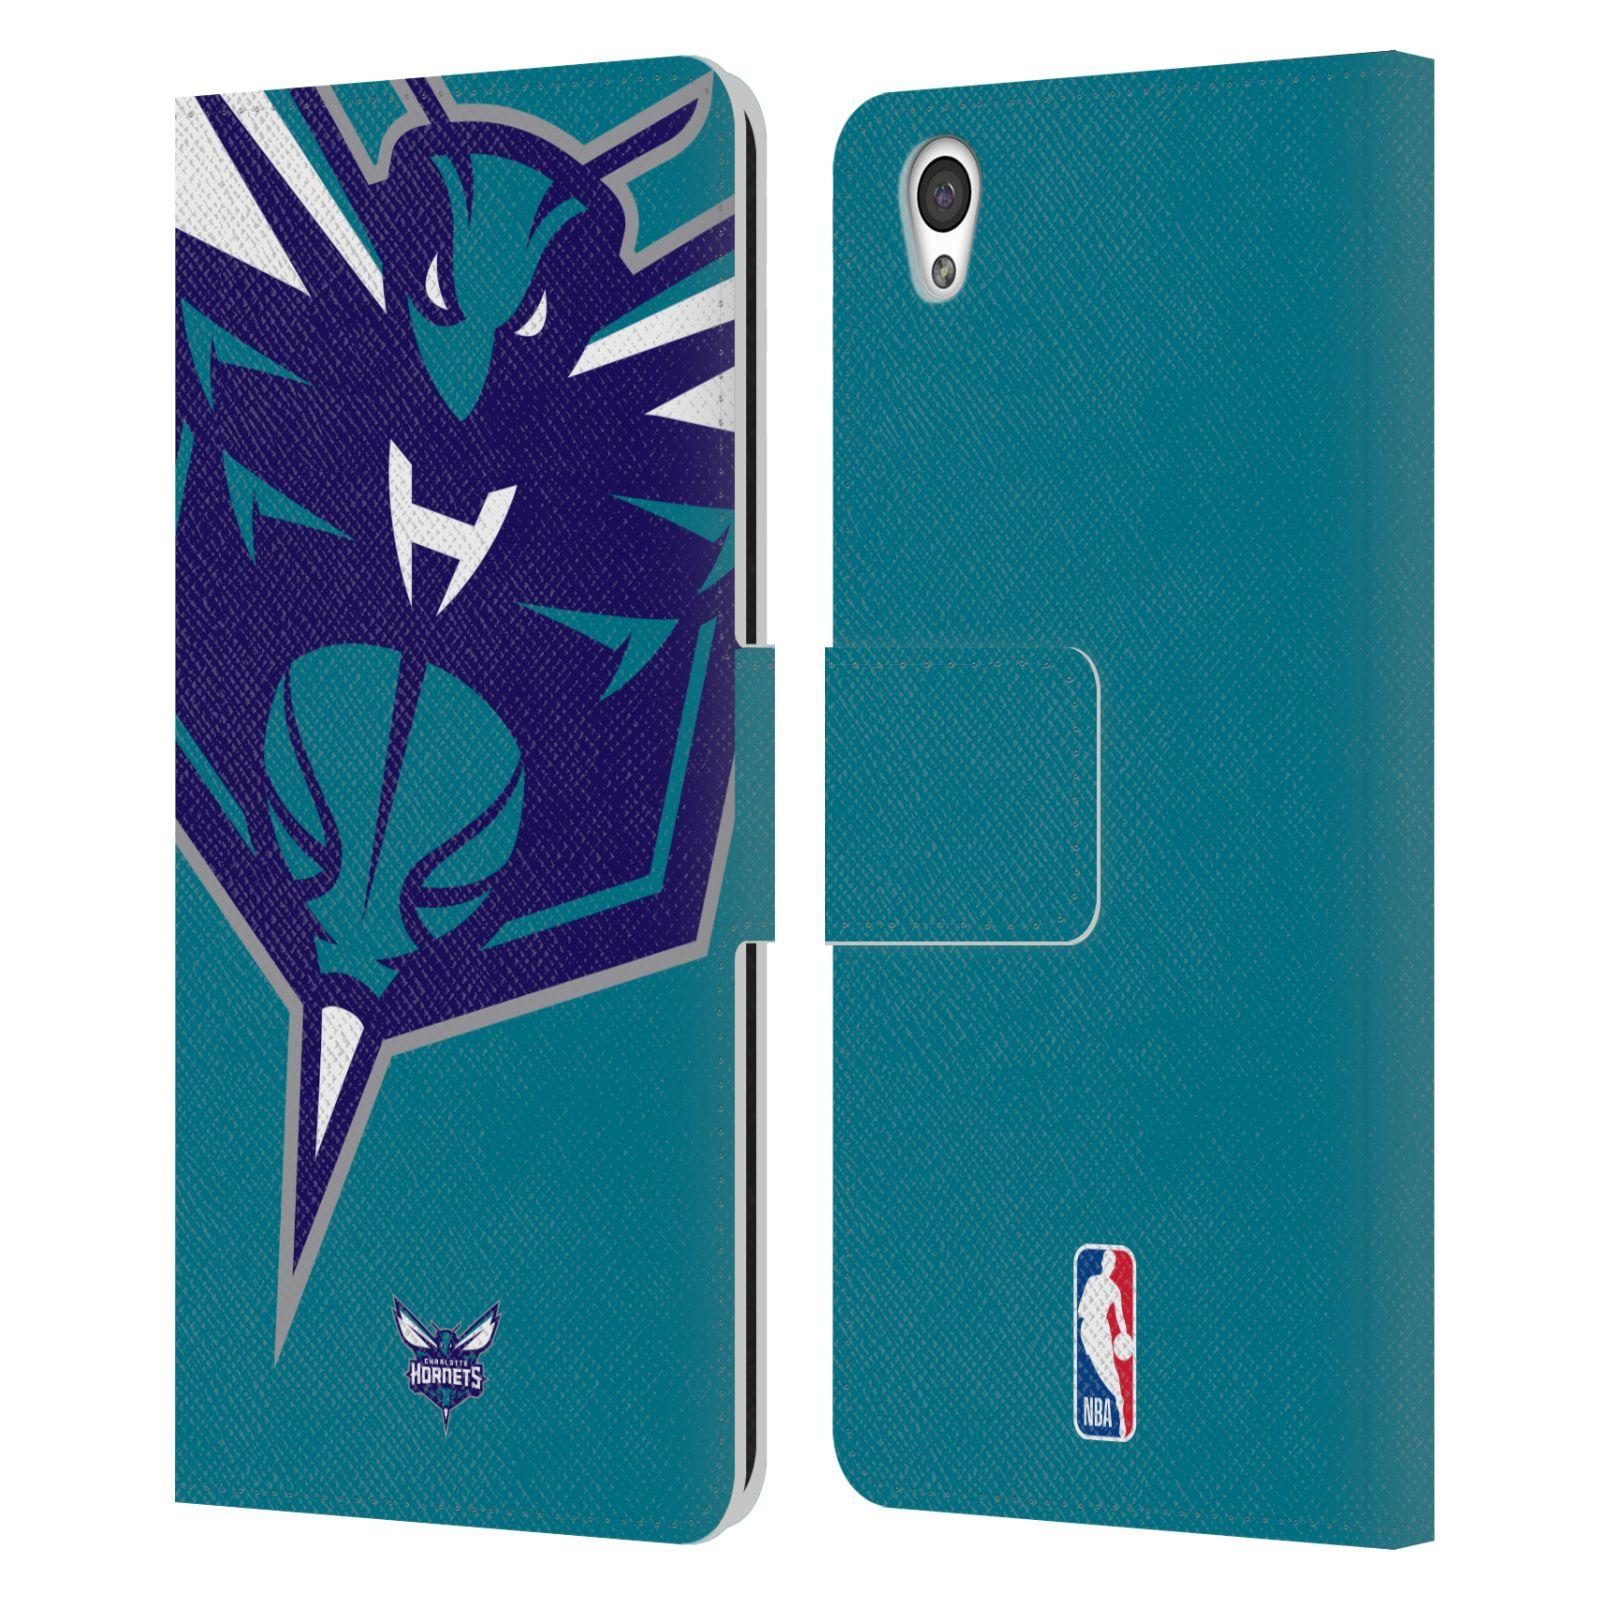 Pouzdro na mobil OnePlus X - Head Case -NBA - Charlotte Hornets modrá barva velký znak